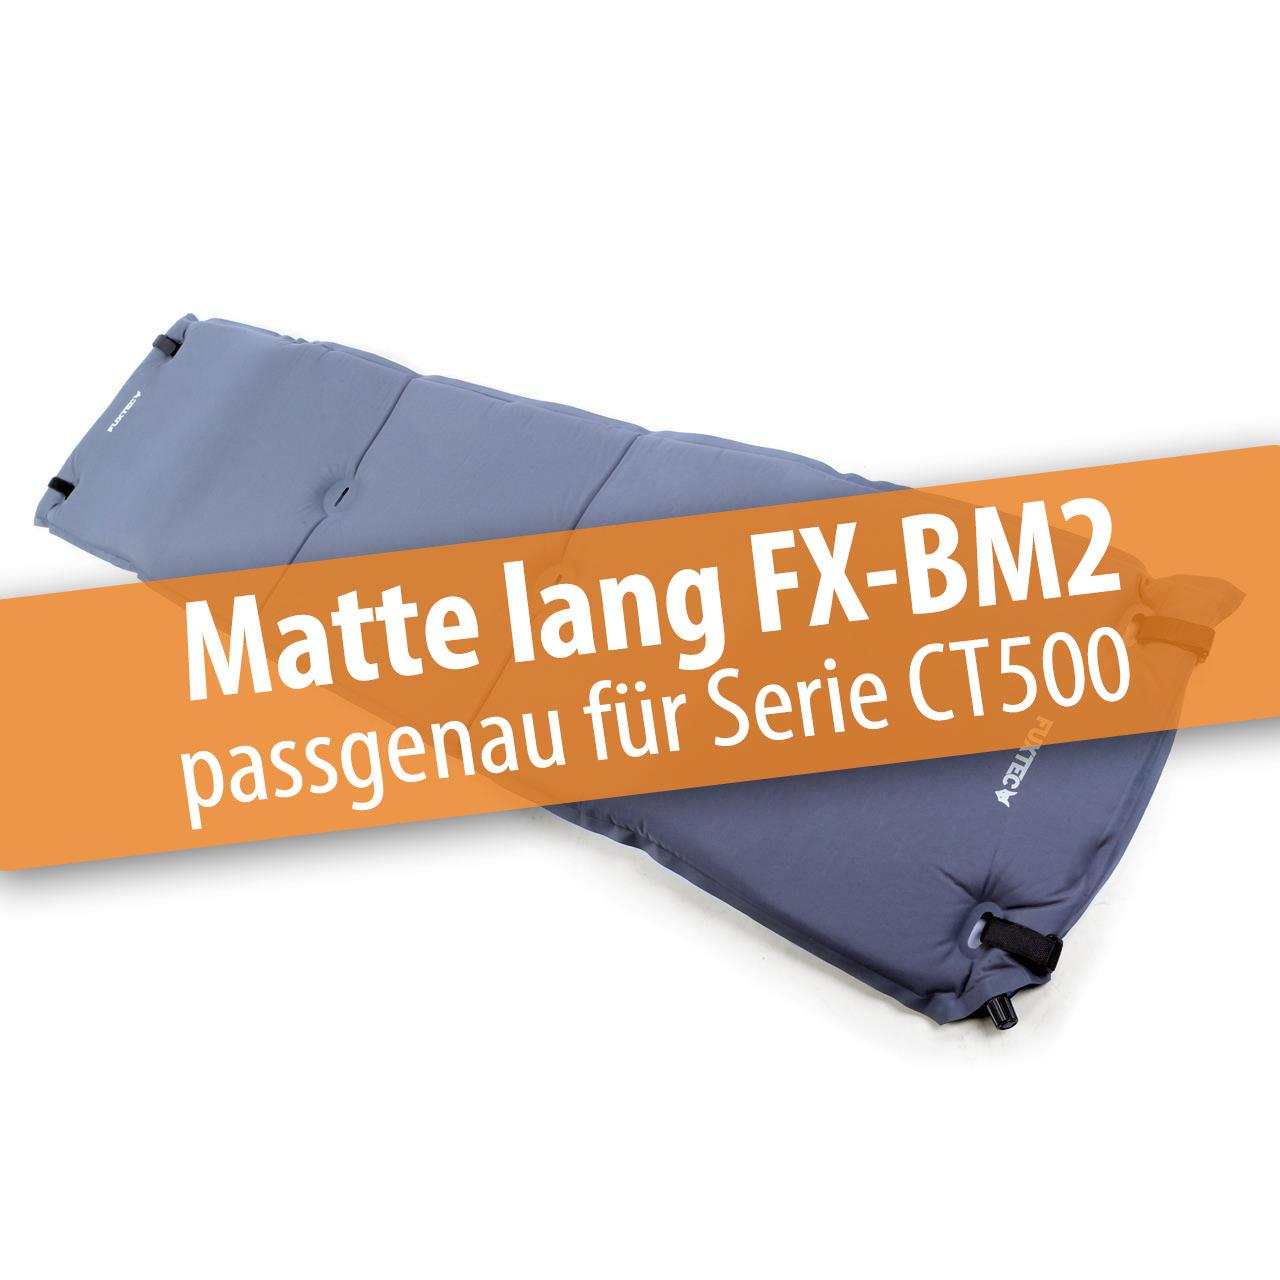 FUXTEC Bollerwagenmatte FX-BM2